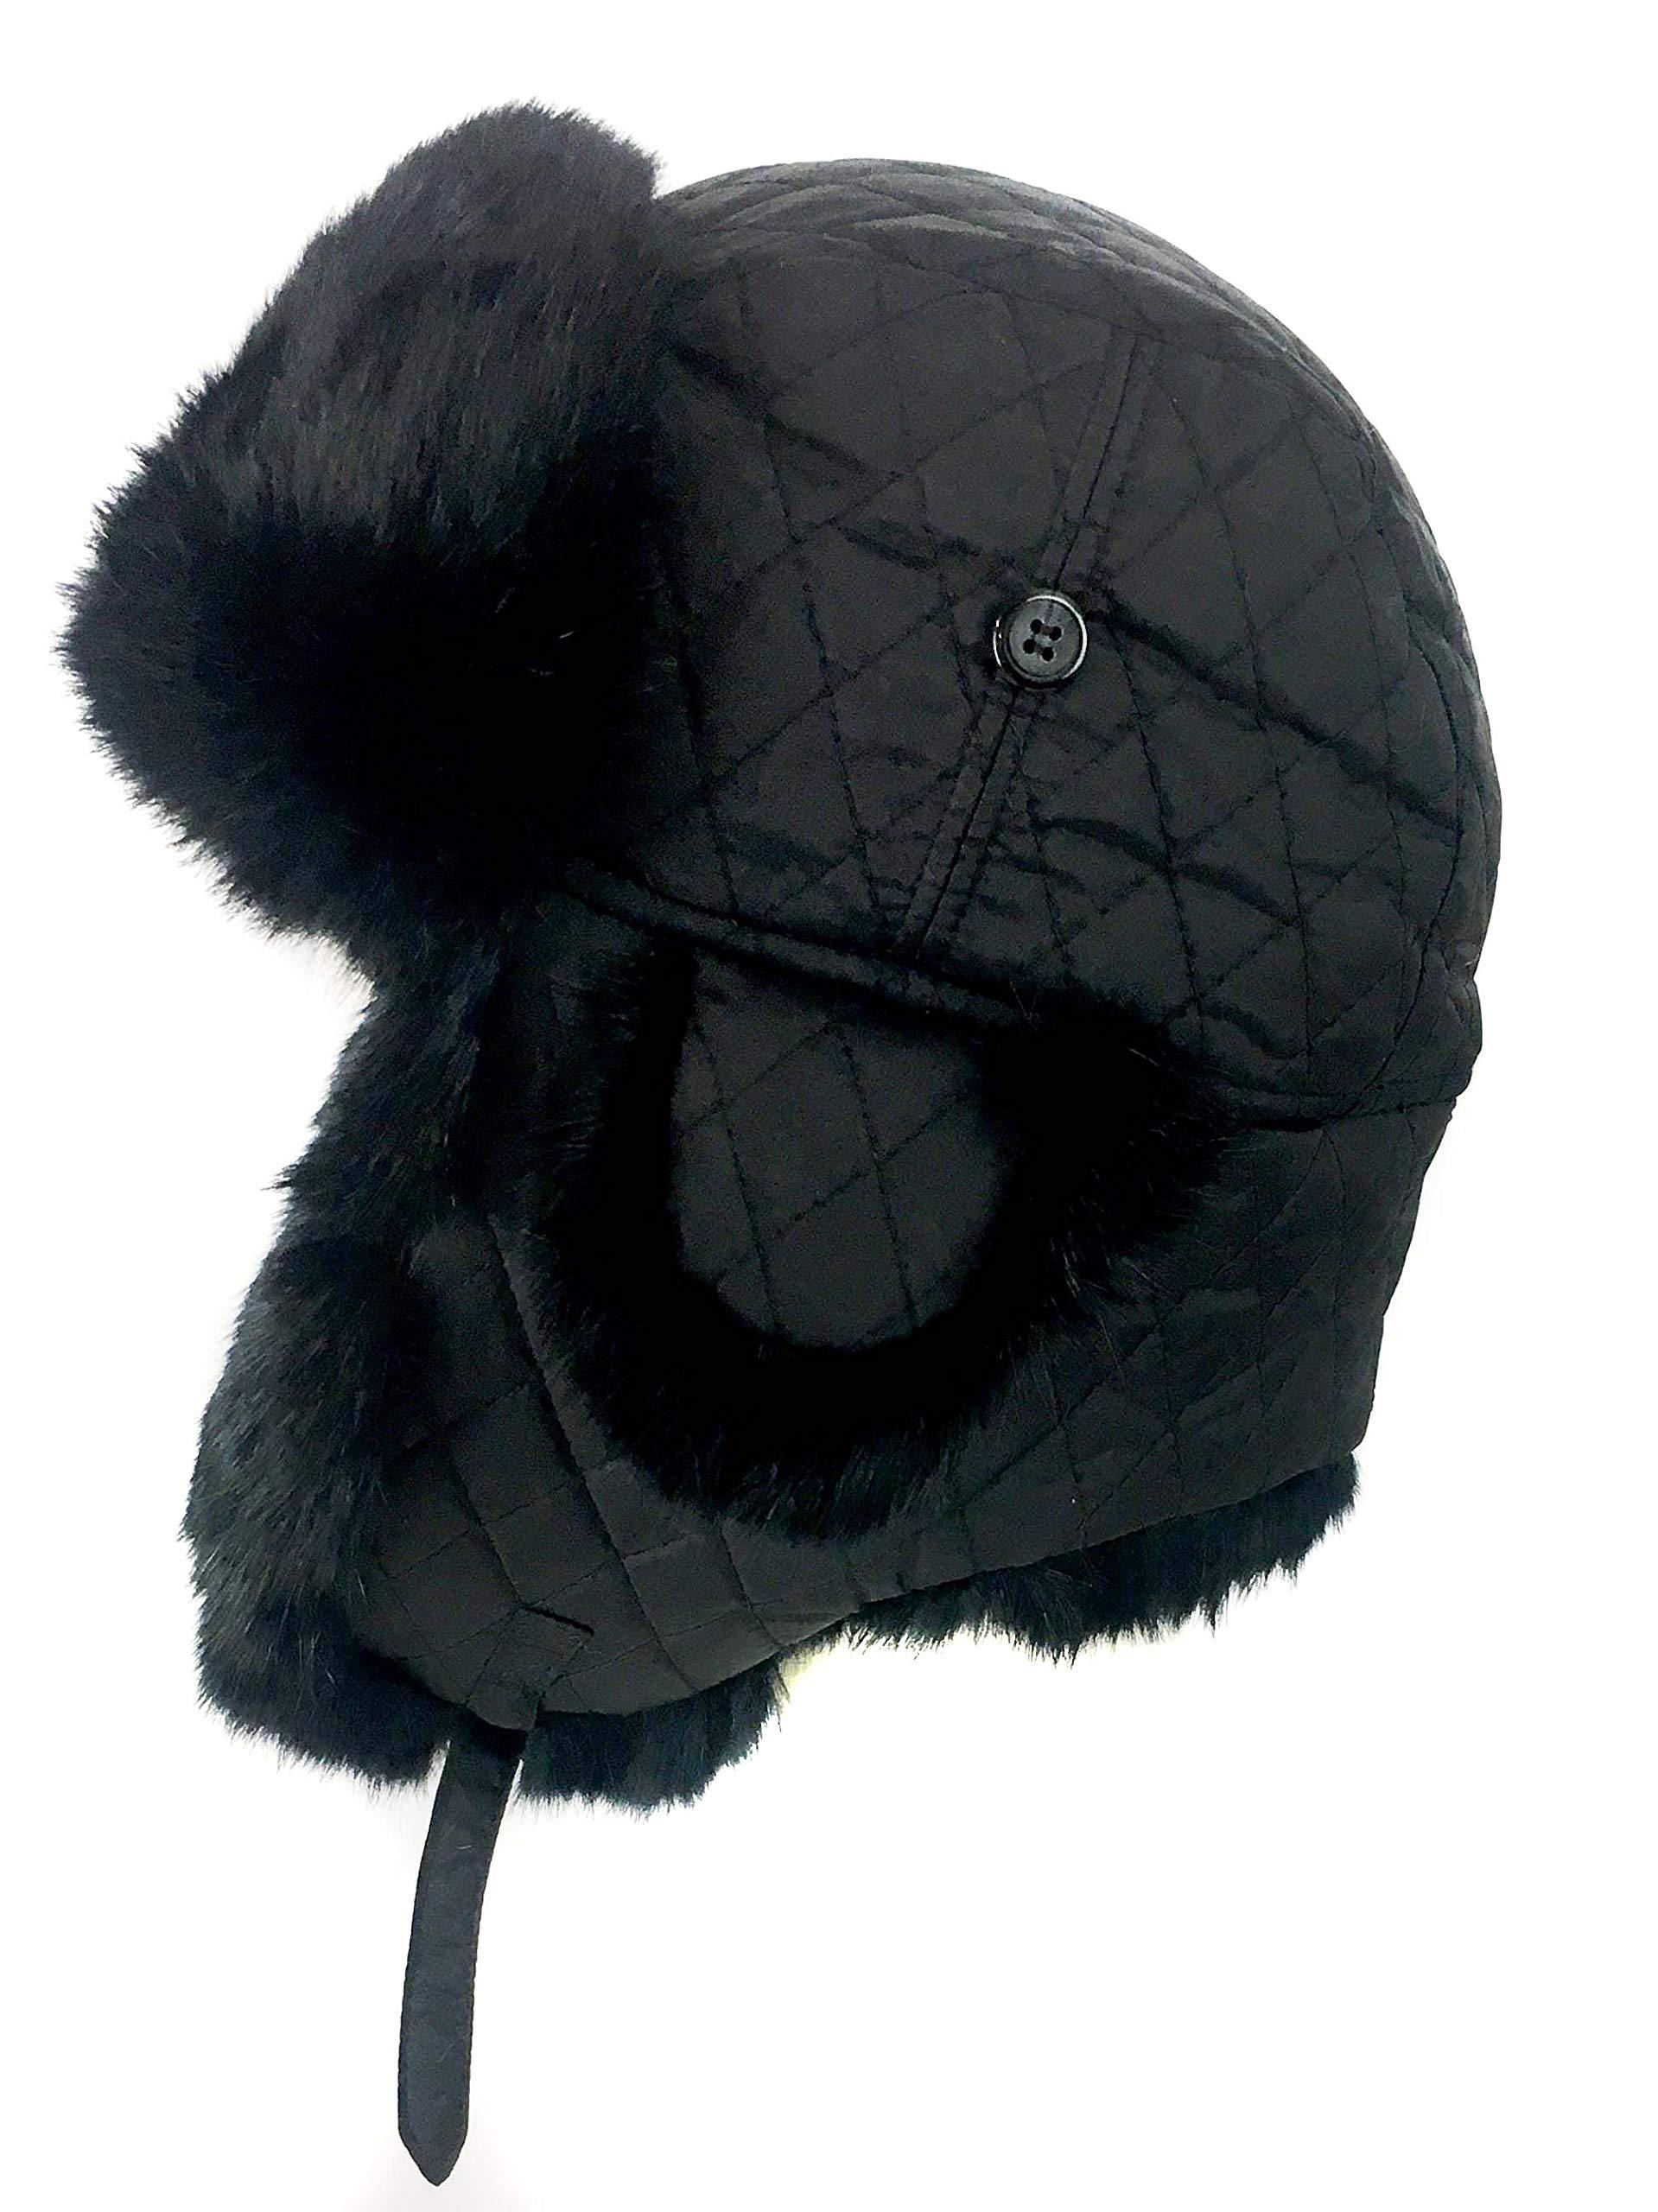 surell Trapper Aviator Hat with Rabbit Fur Trim - Warm Bomber Trooper Hat - Perfect Winter Luxury Gift (Black)